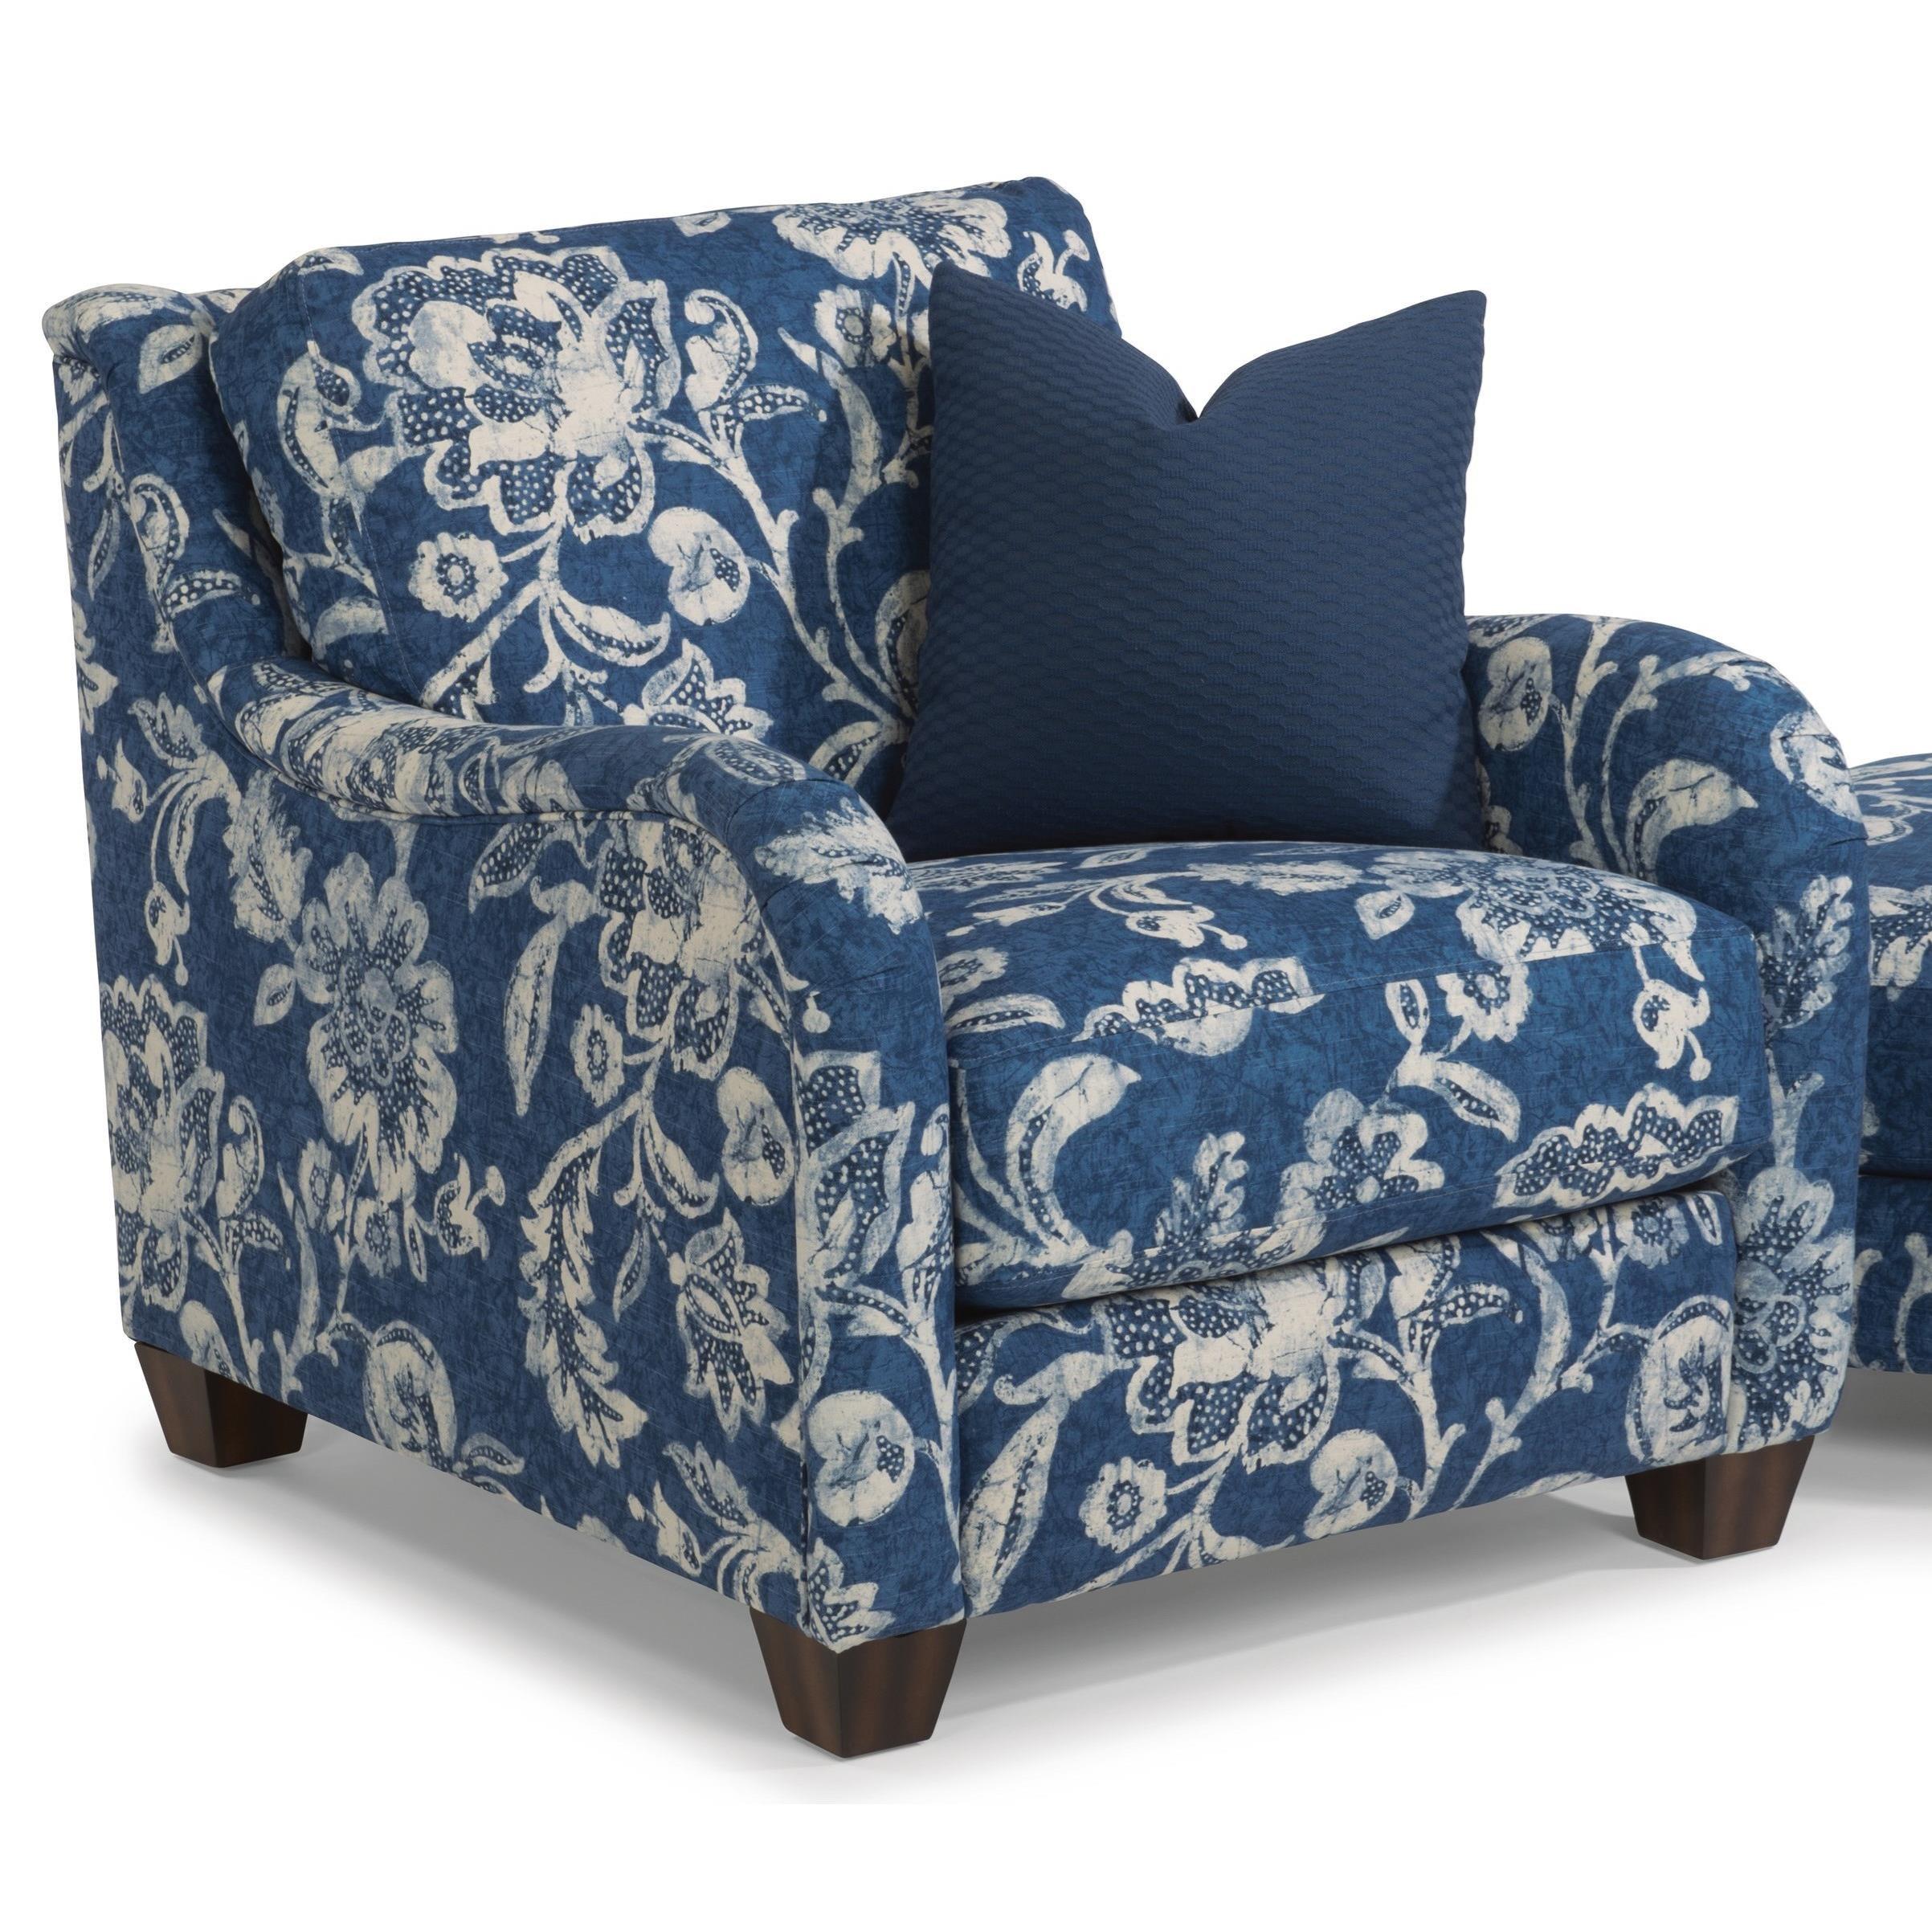 Flexsteel Fortuna Chair - Item Number: 7908-10-066-40